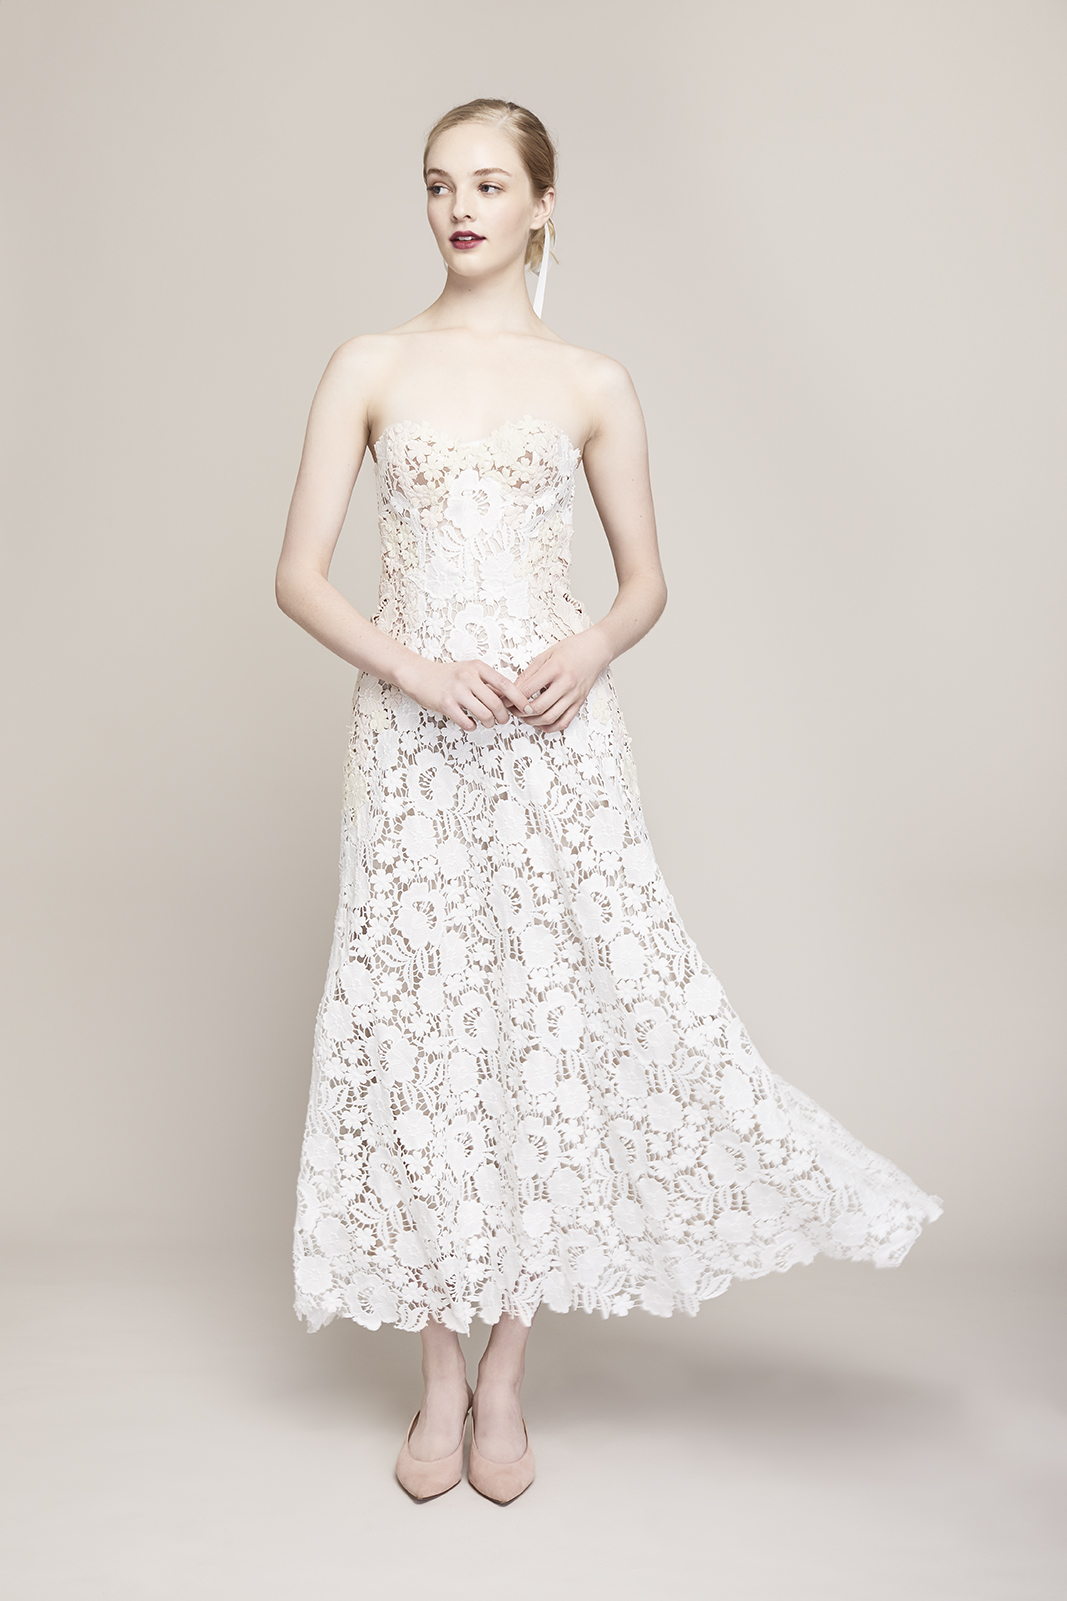 Lela-Rose-Bridal-Fall-2019-The-Beaufort-Front.jpg